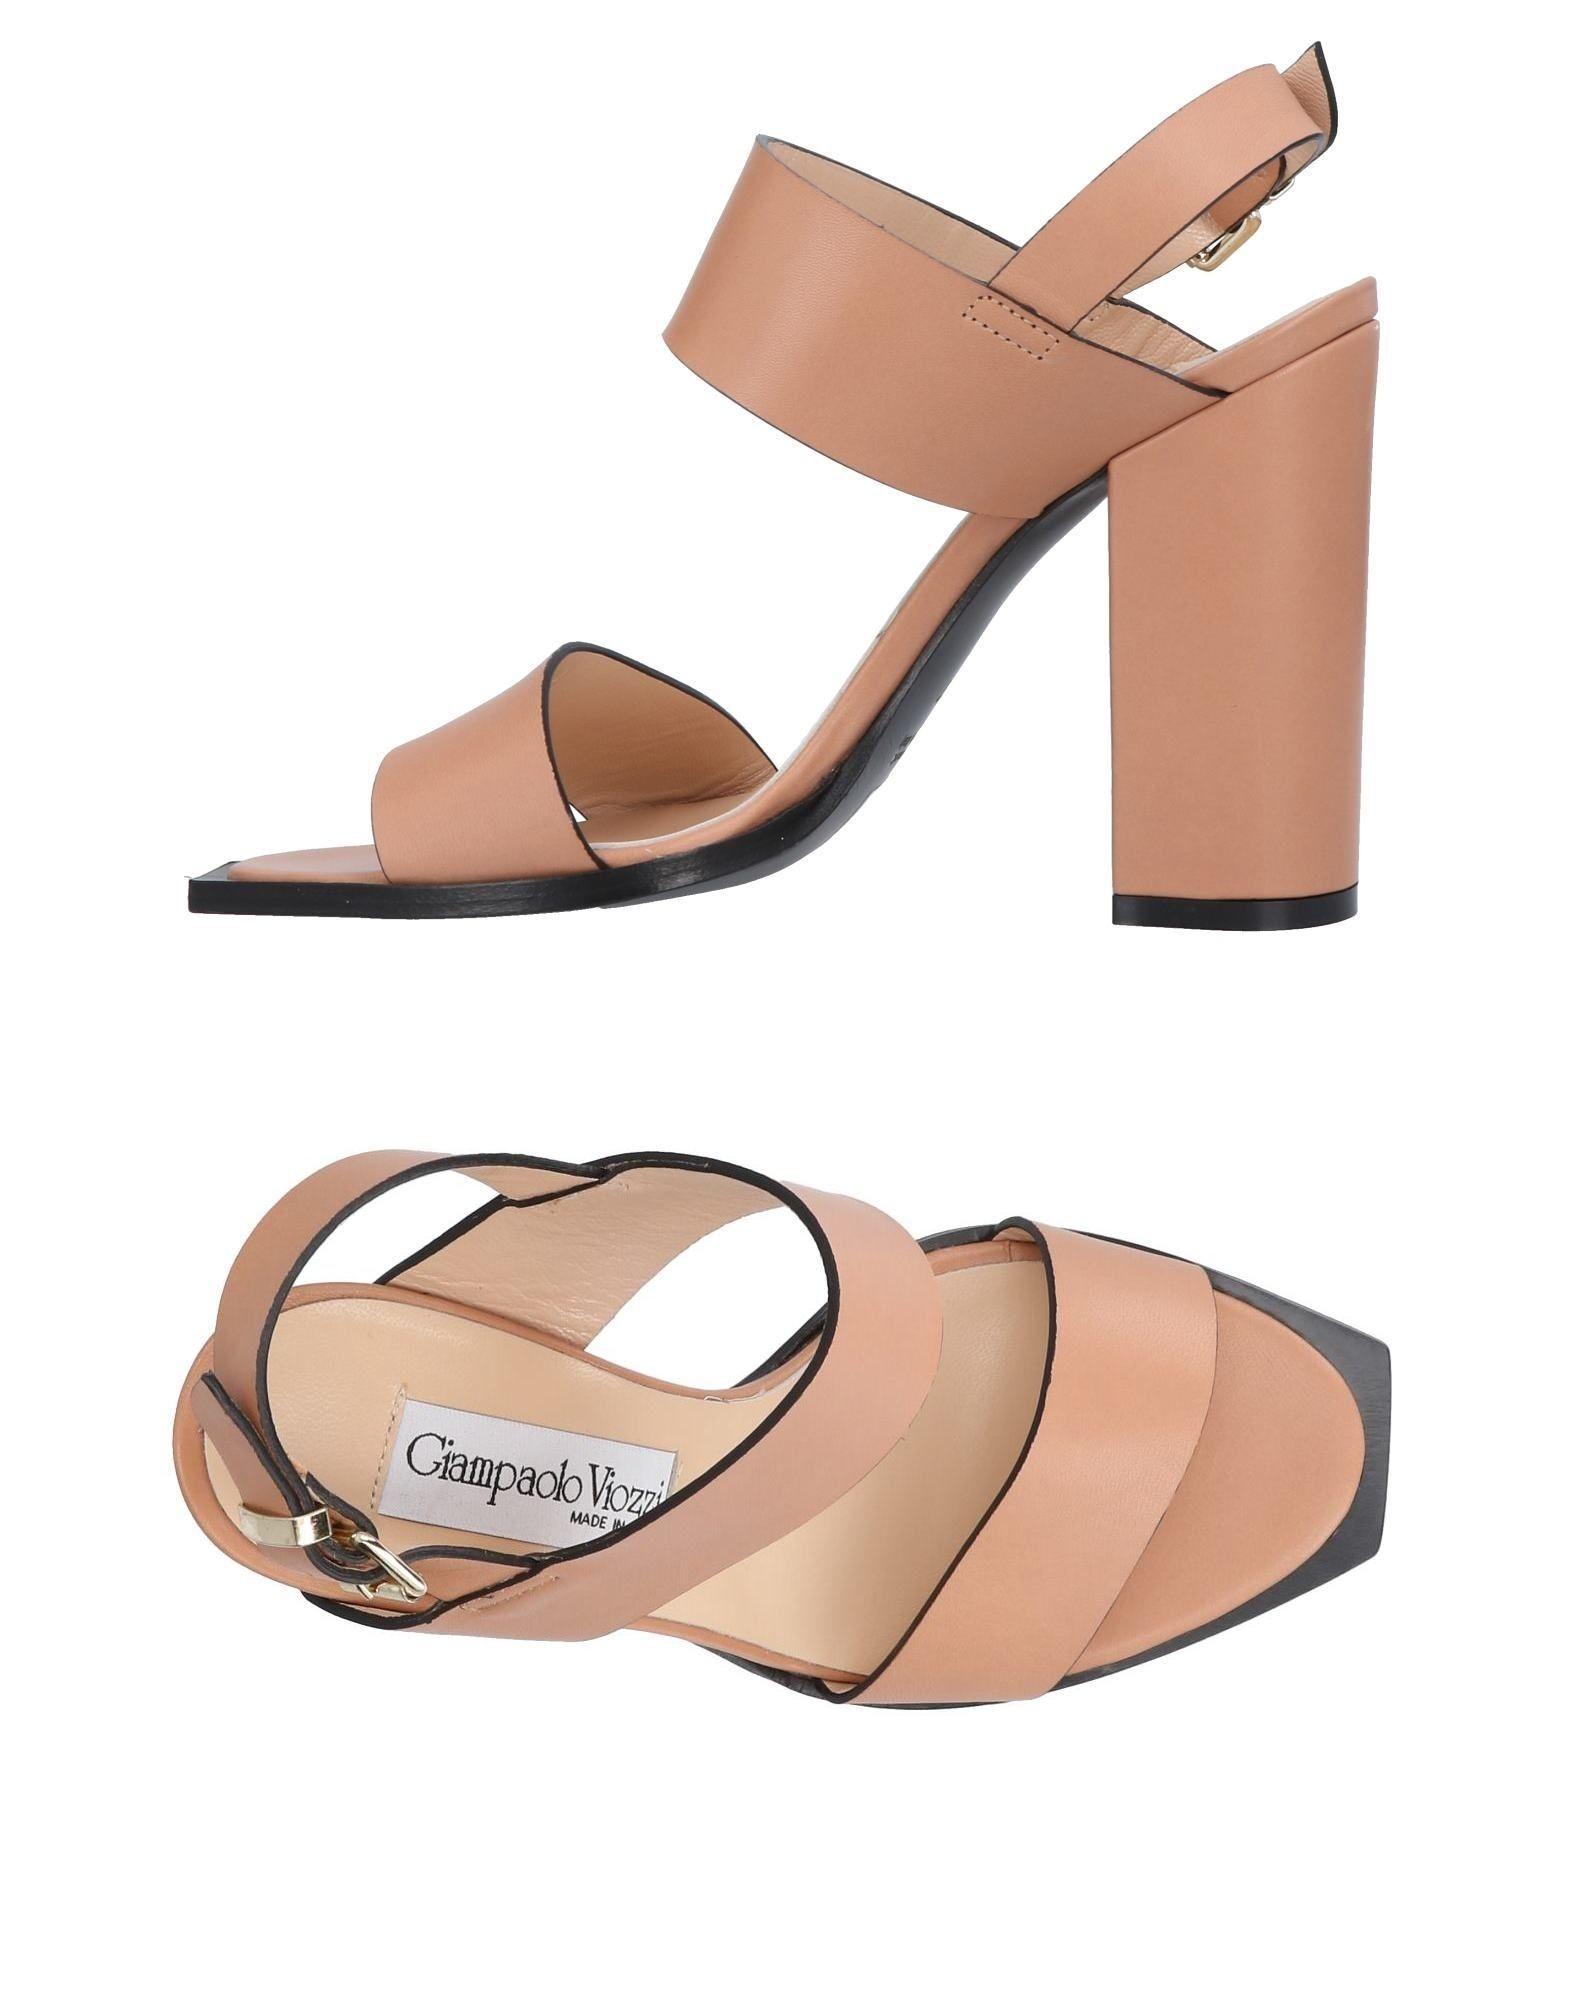 Giampaolo Viozzi Sandals - Women Giampaolo Viozzi Australia Sandals online on  Australia Viozzi - 11465433AF f24d58